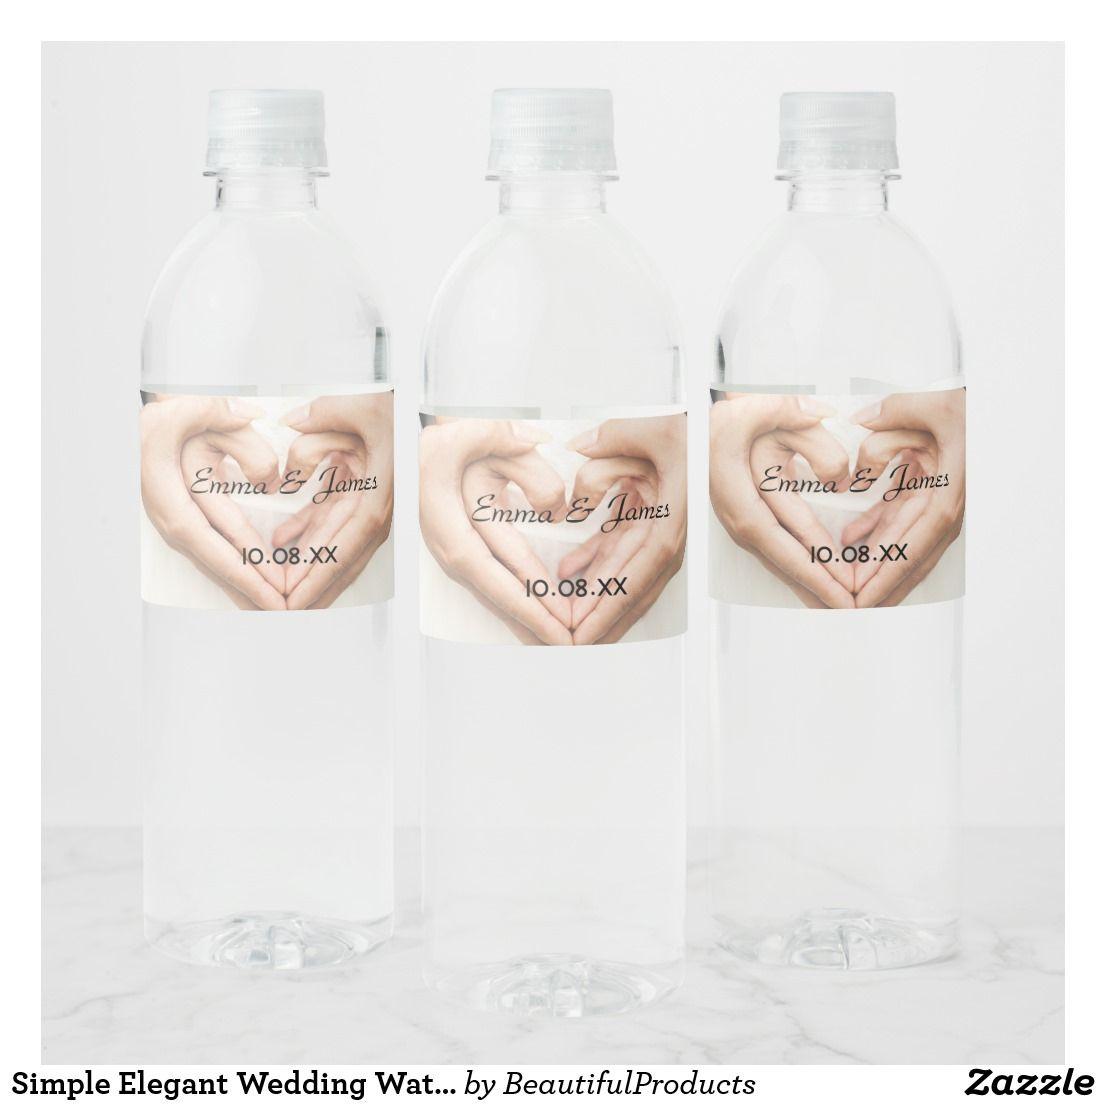 Simple Elegant Wedding Water Bottle Labels